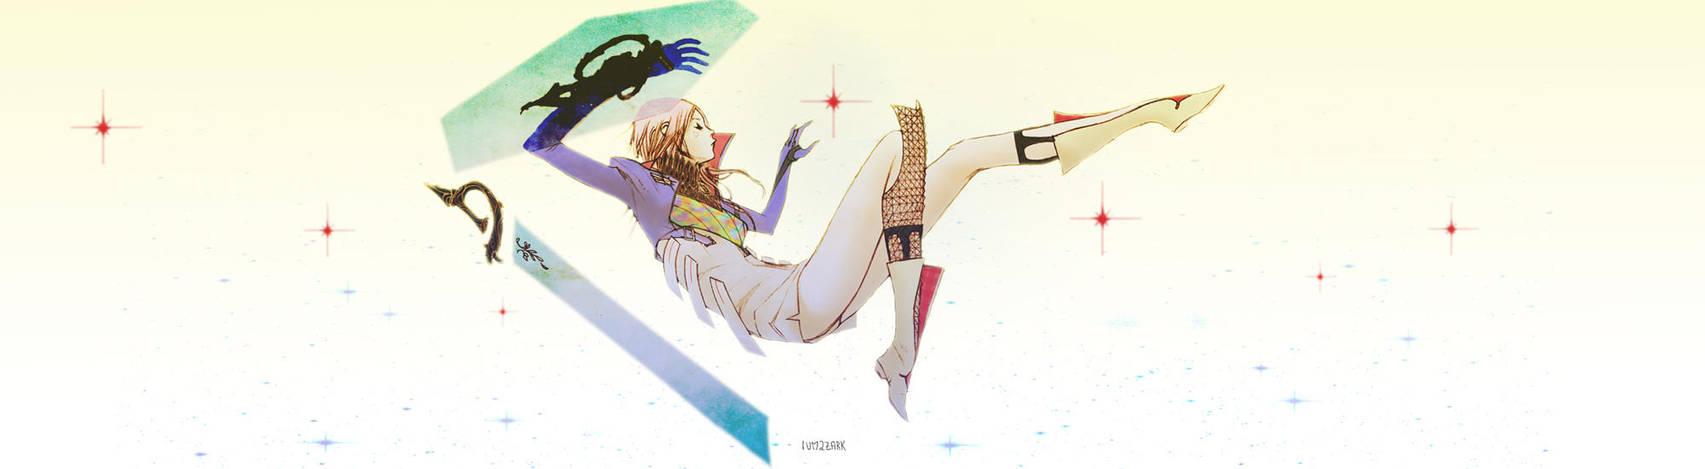 Lightning Returns - FFXIII  - Galatic Gala by iumazark